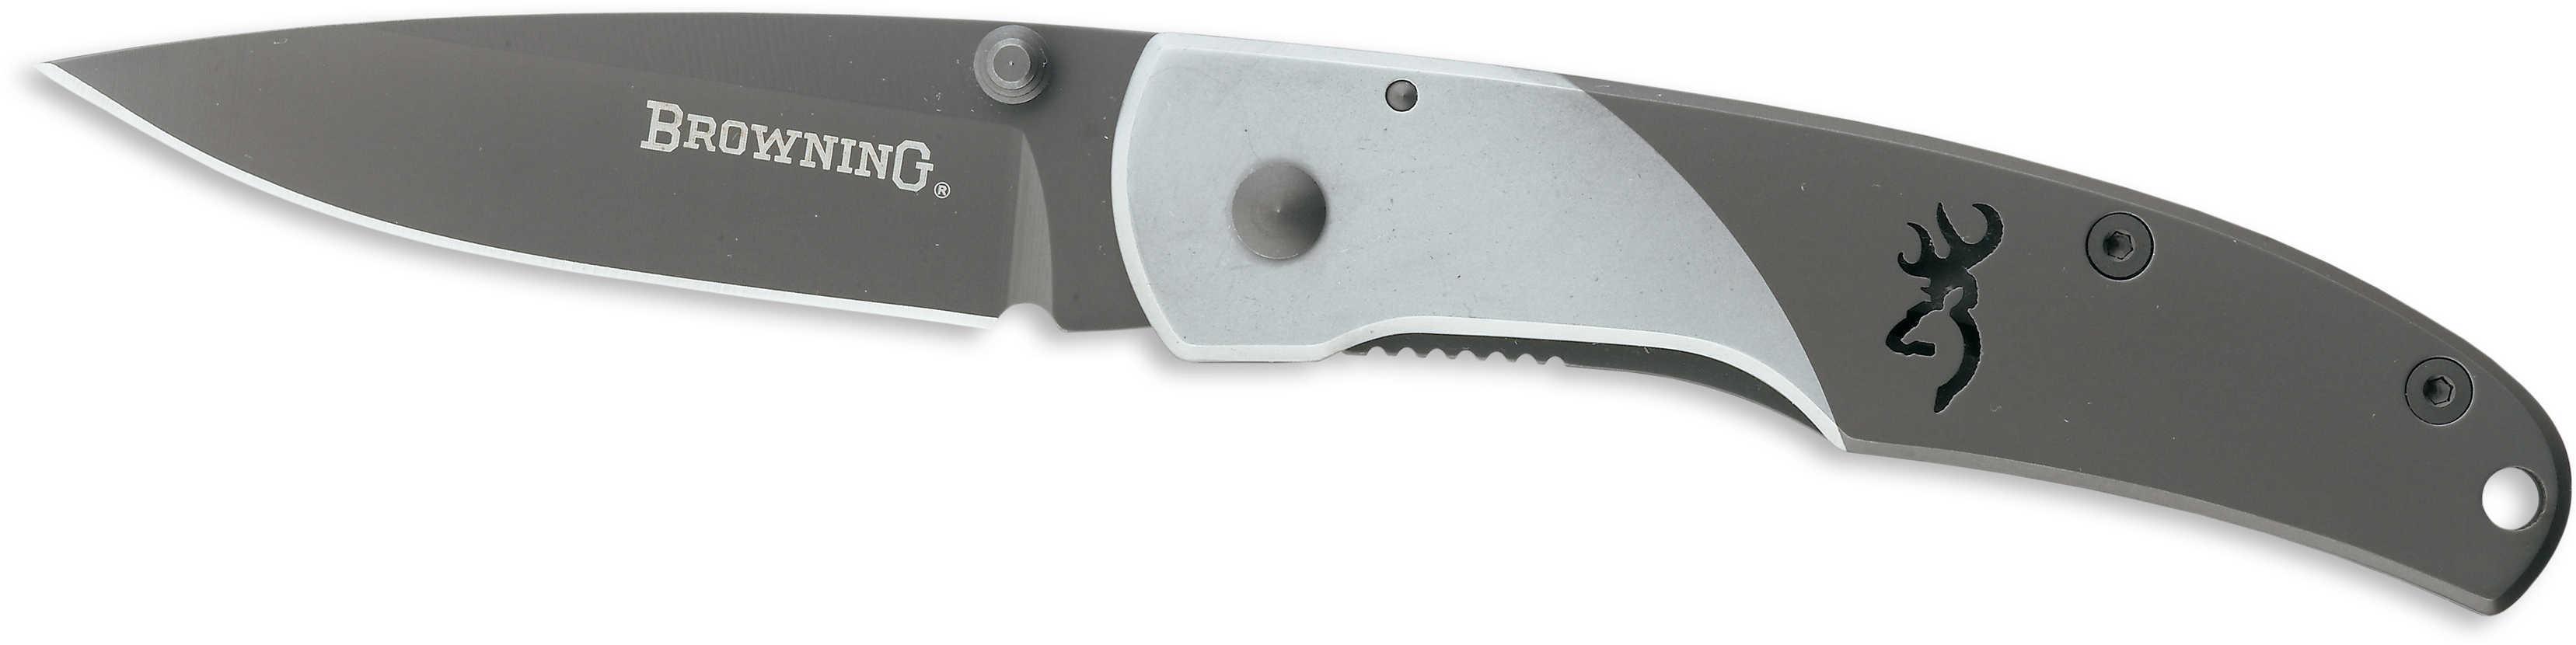 Browning Mountain Ti Folding Knife Medium, Gray 322560